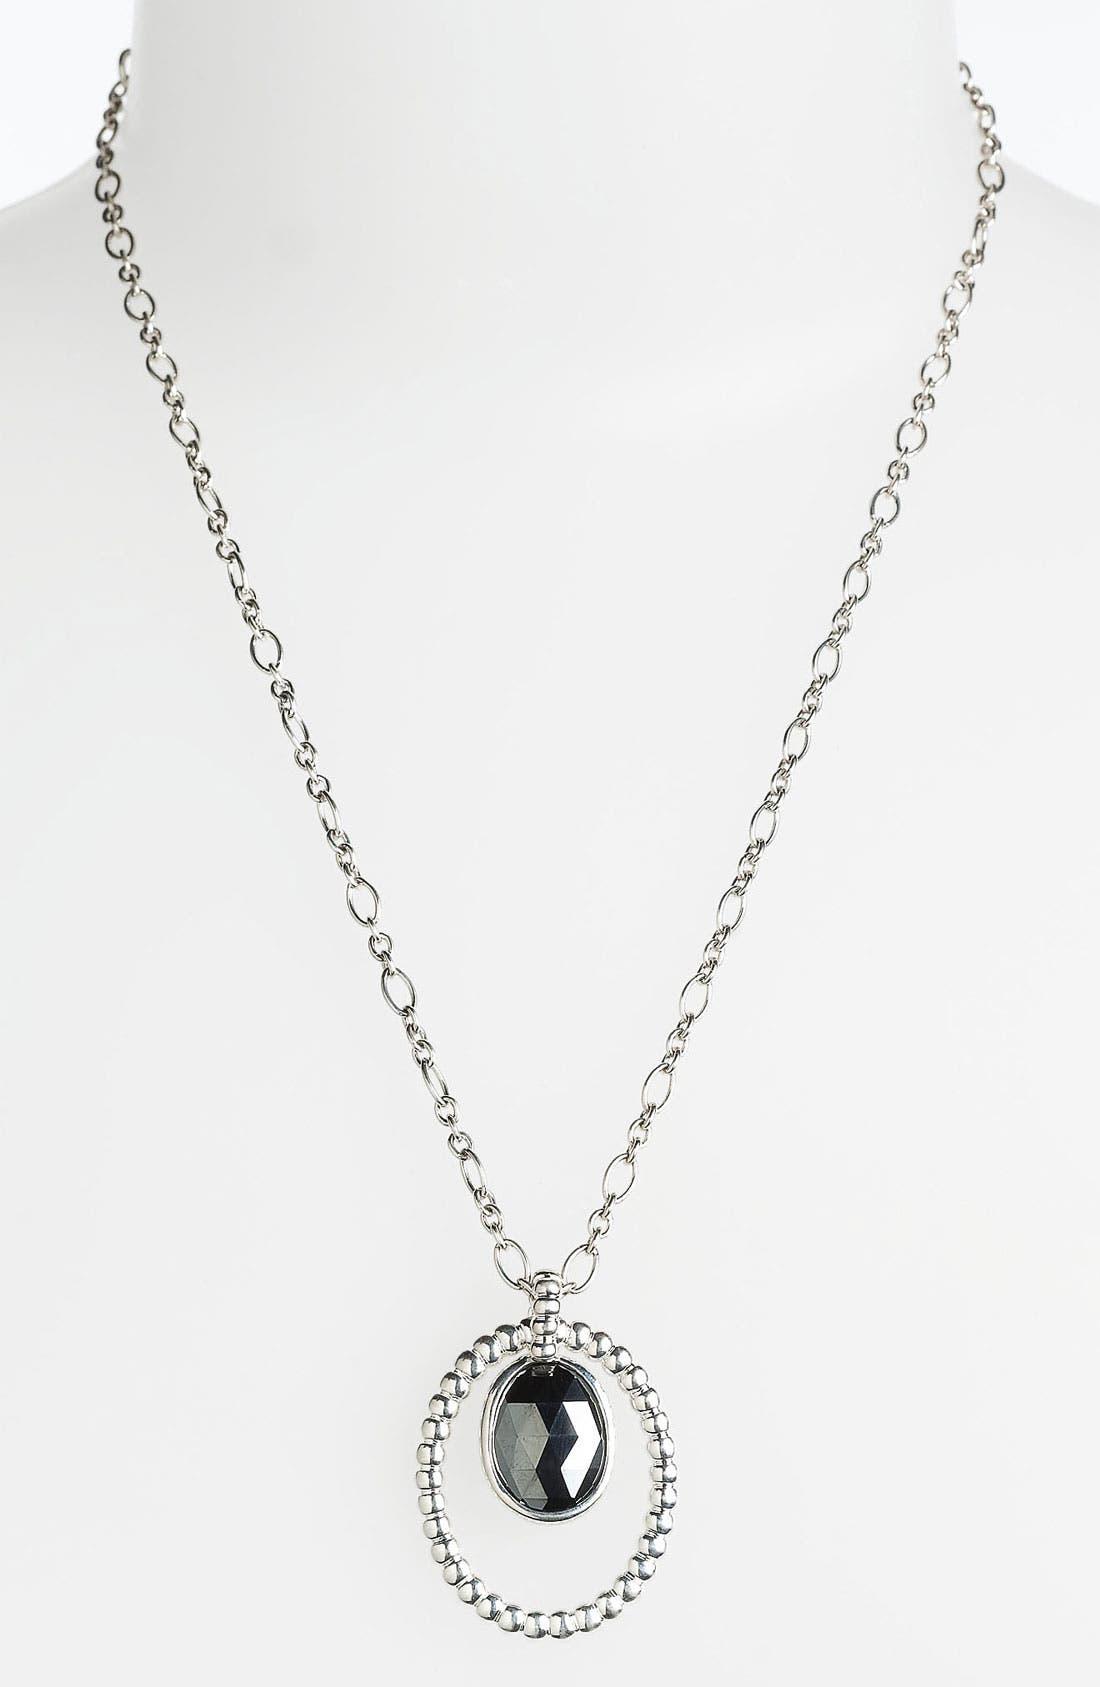 Main Image - John Hardy 'Bedeg' Oval Pendant Necklace